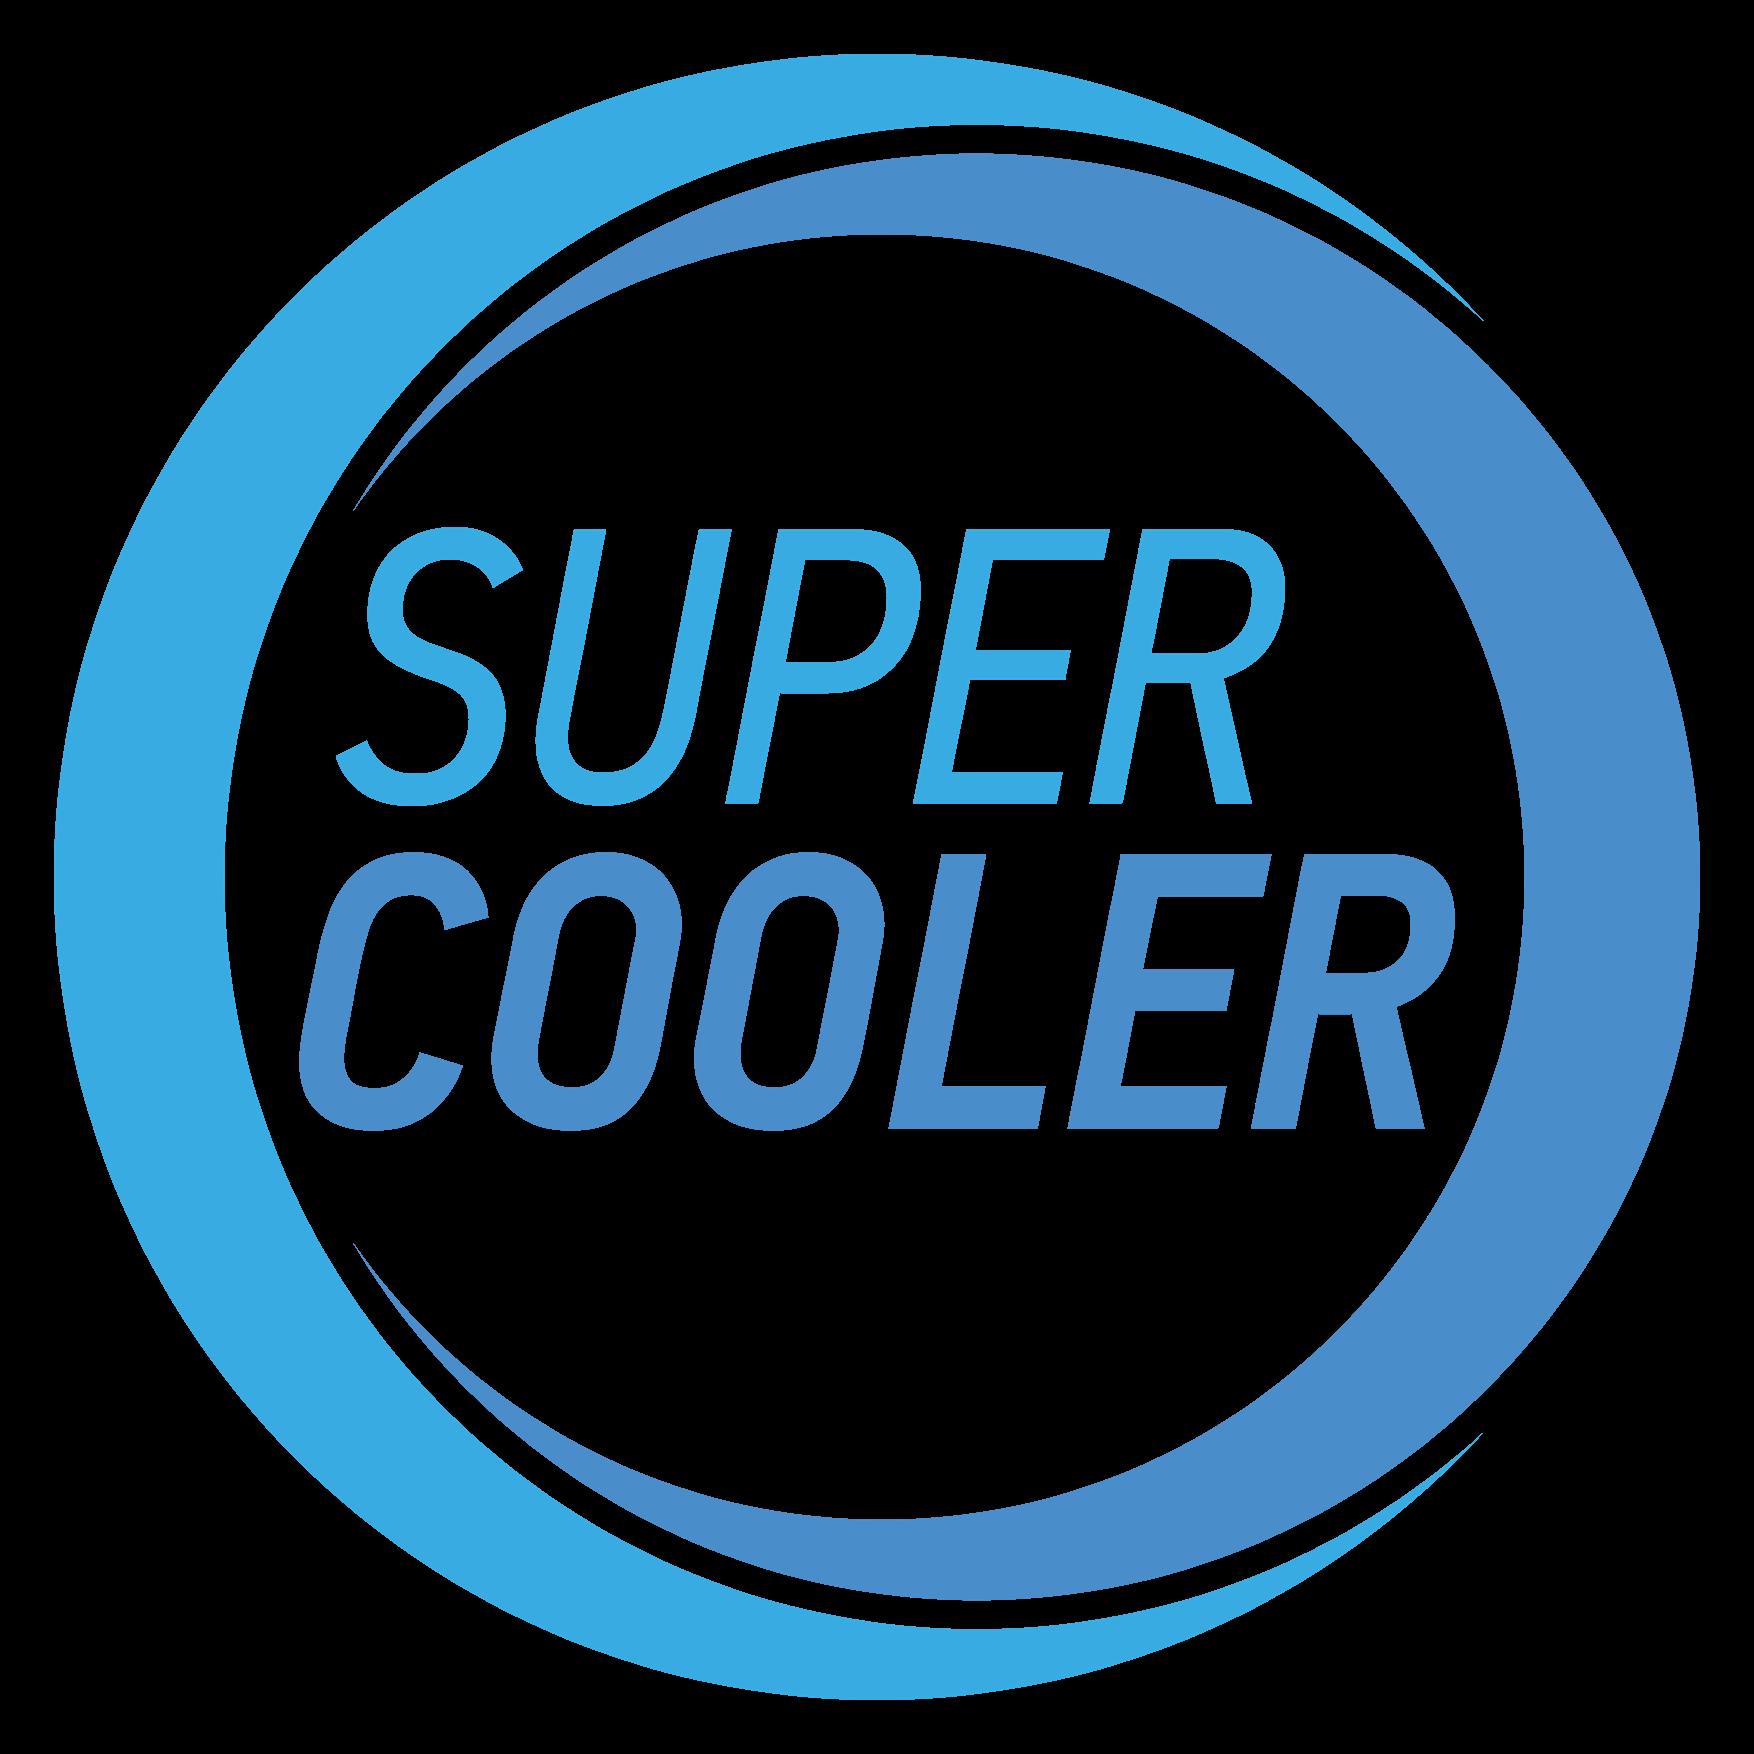 superCooler-logo.png